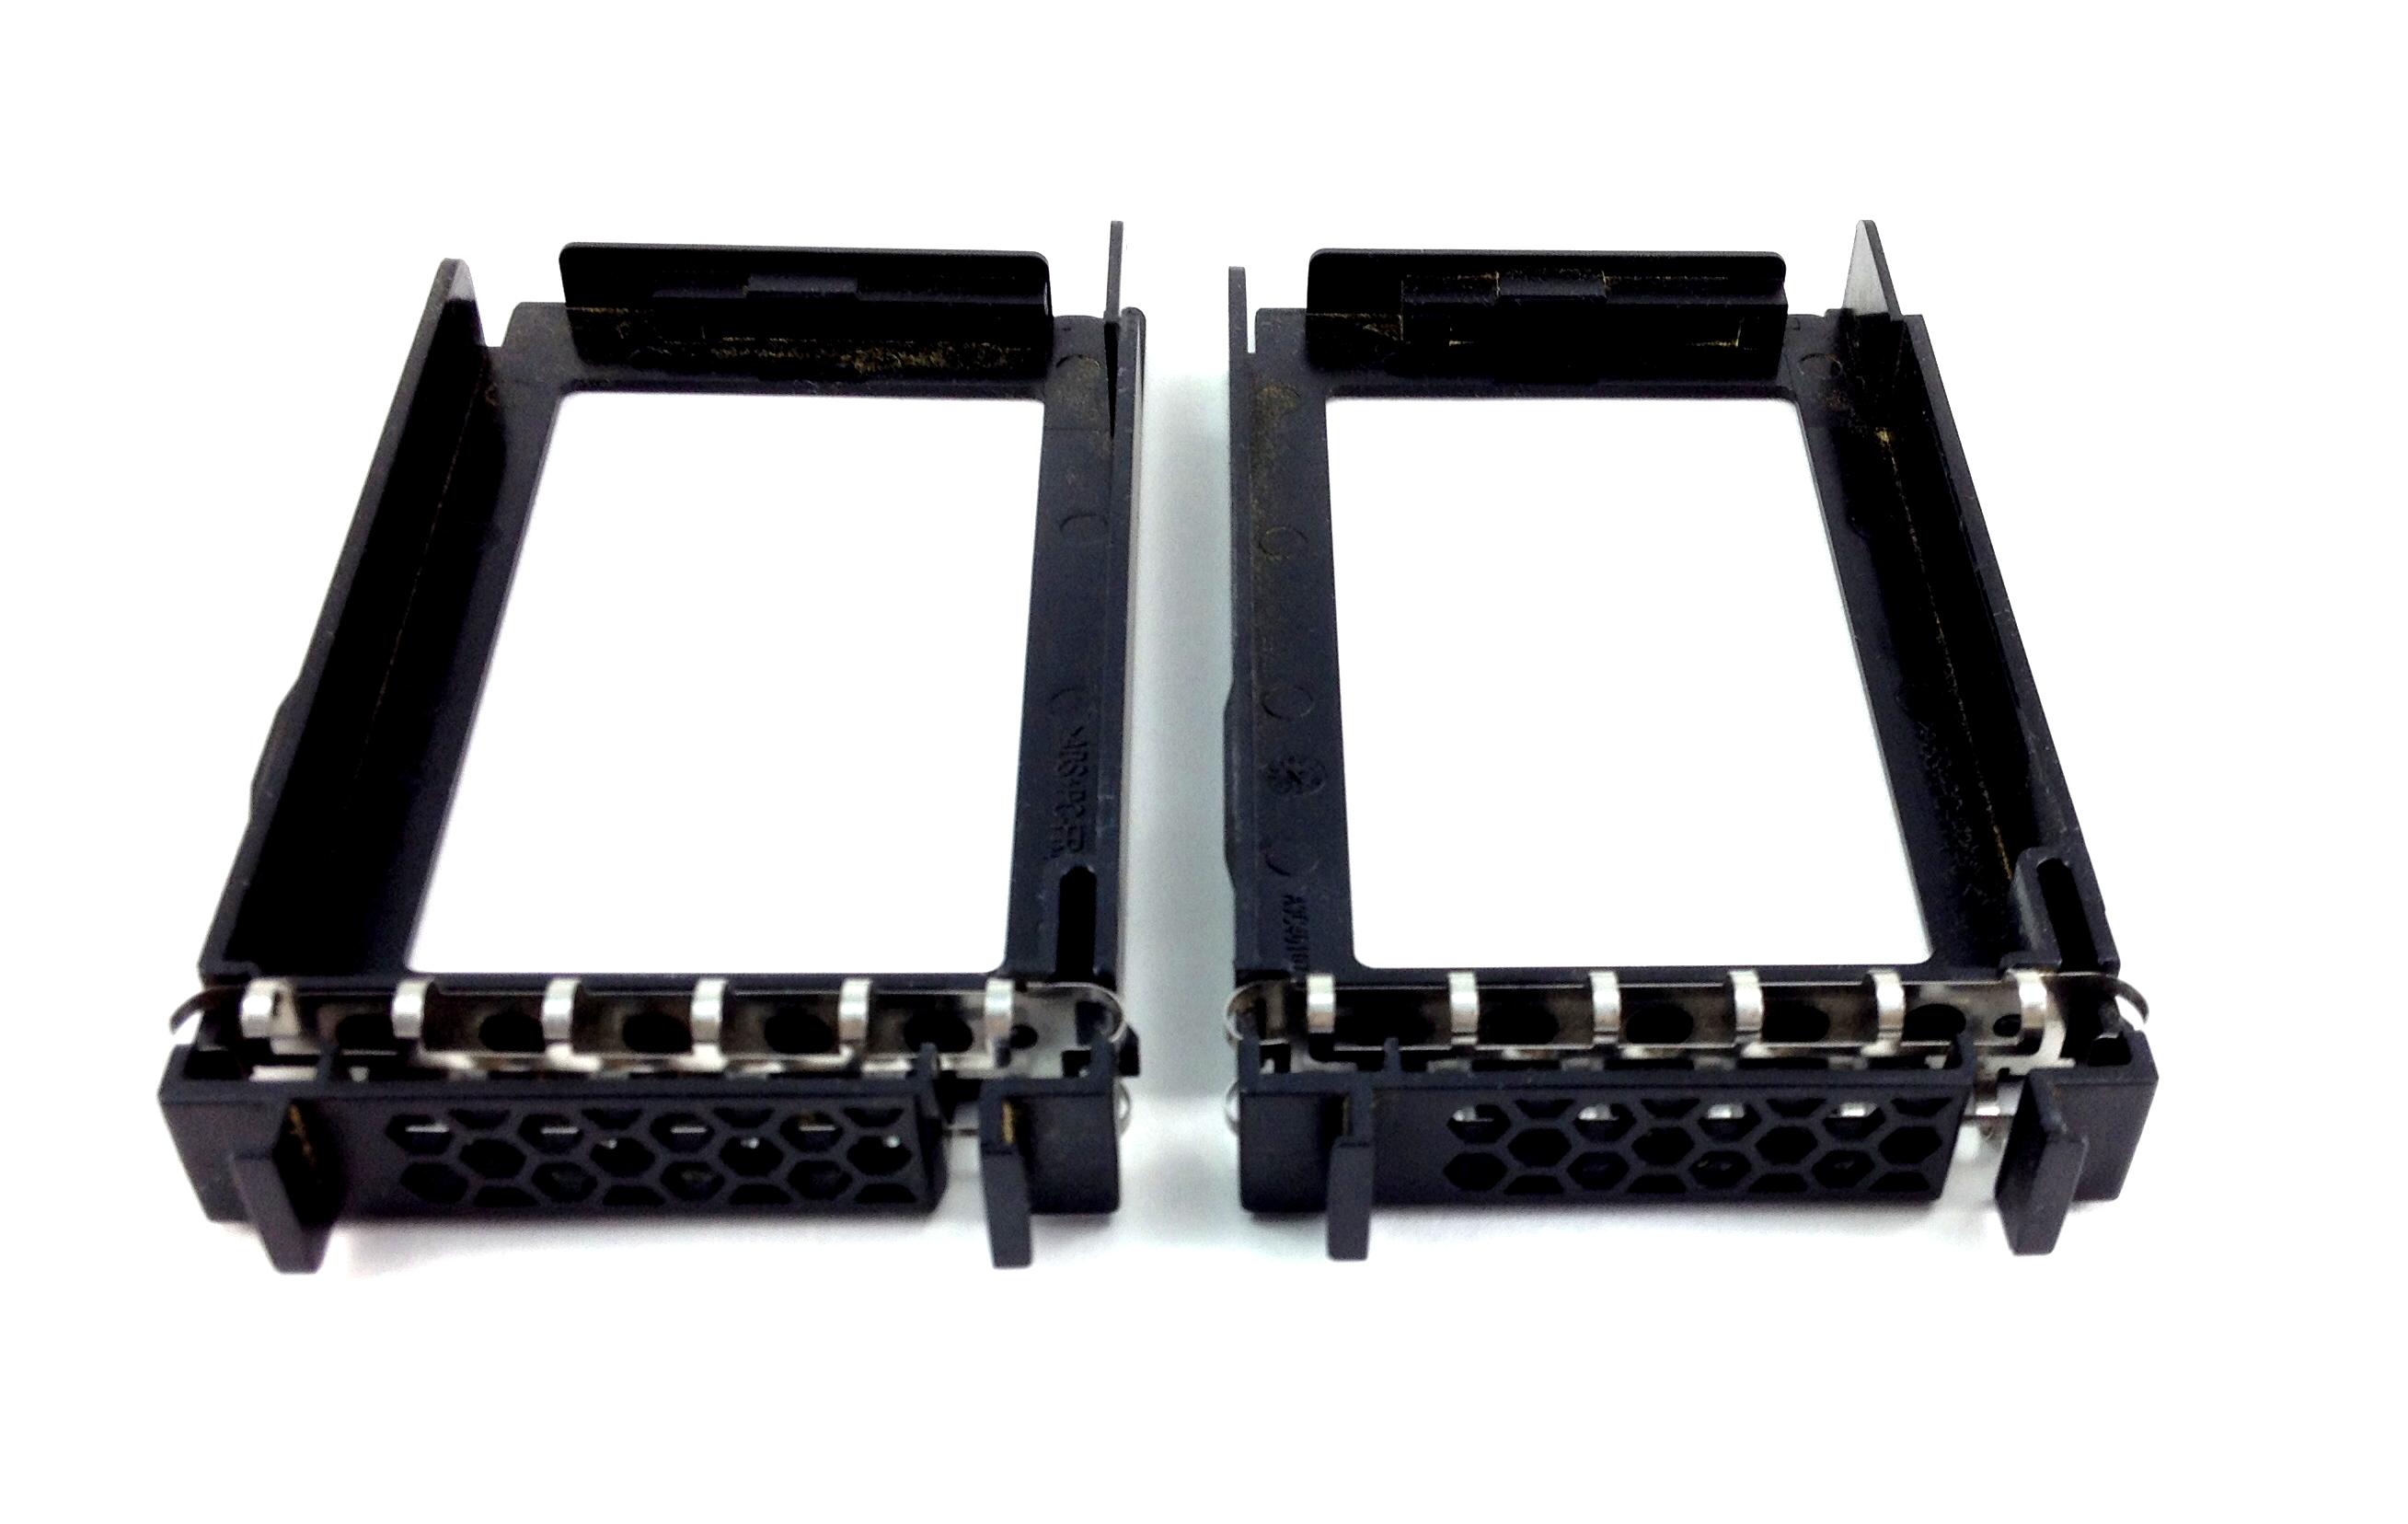 Fujitsu 2.5 Inch Hard Drive Blank (A3C40101976)